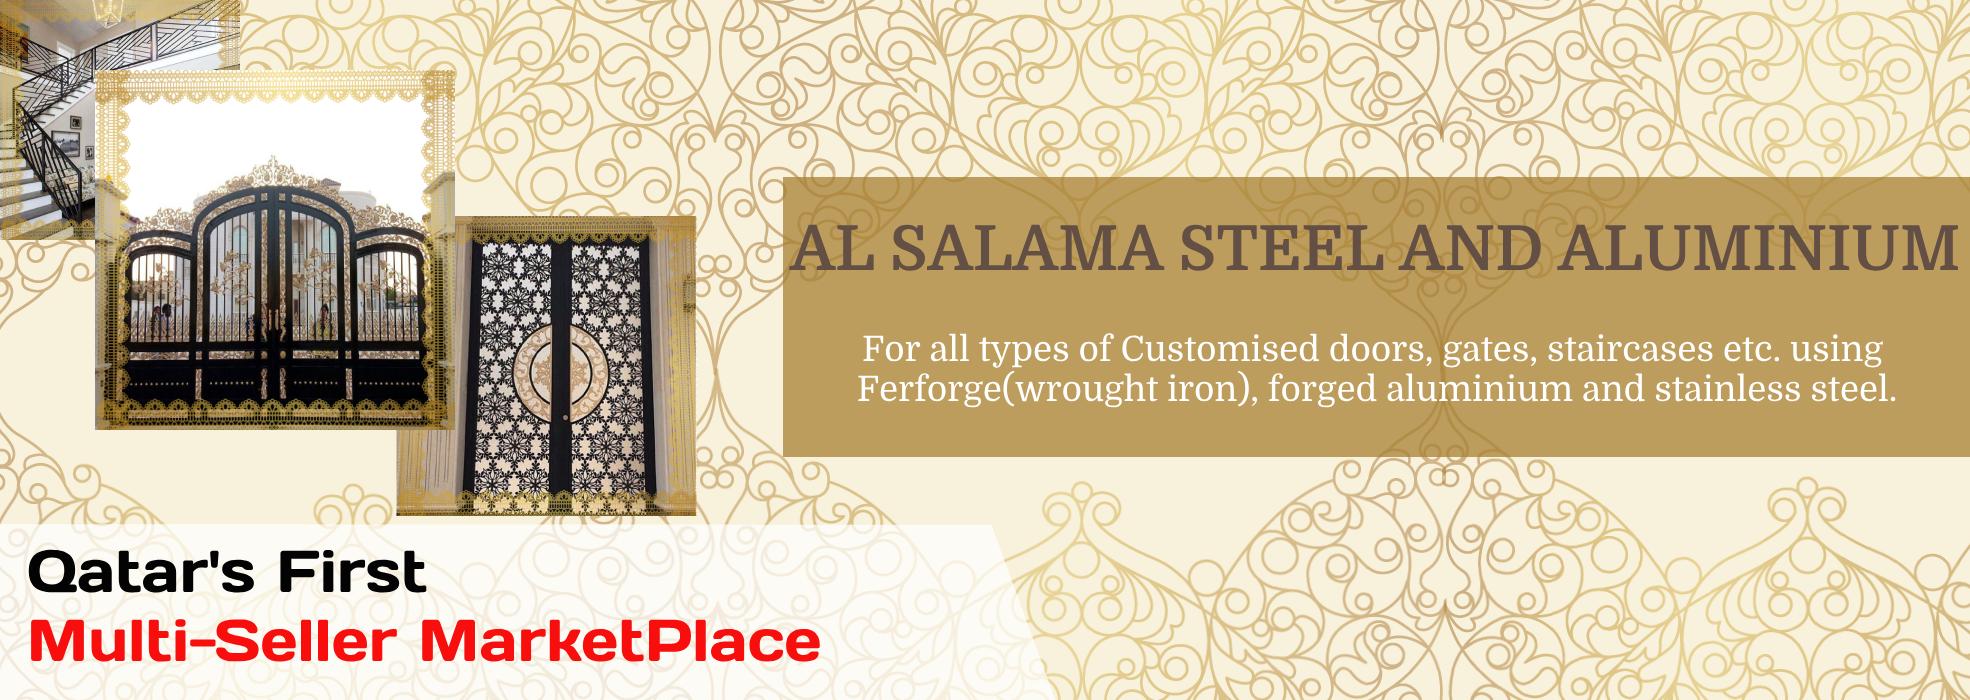 Al Salama Steel and Aluminium